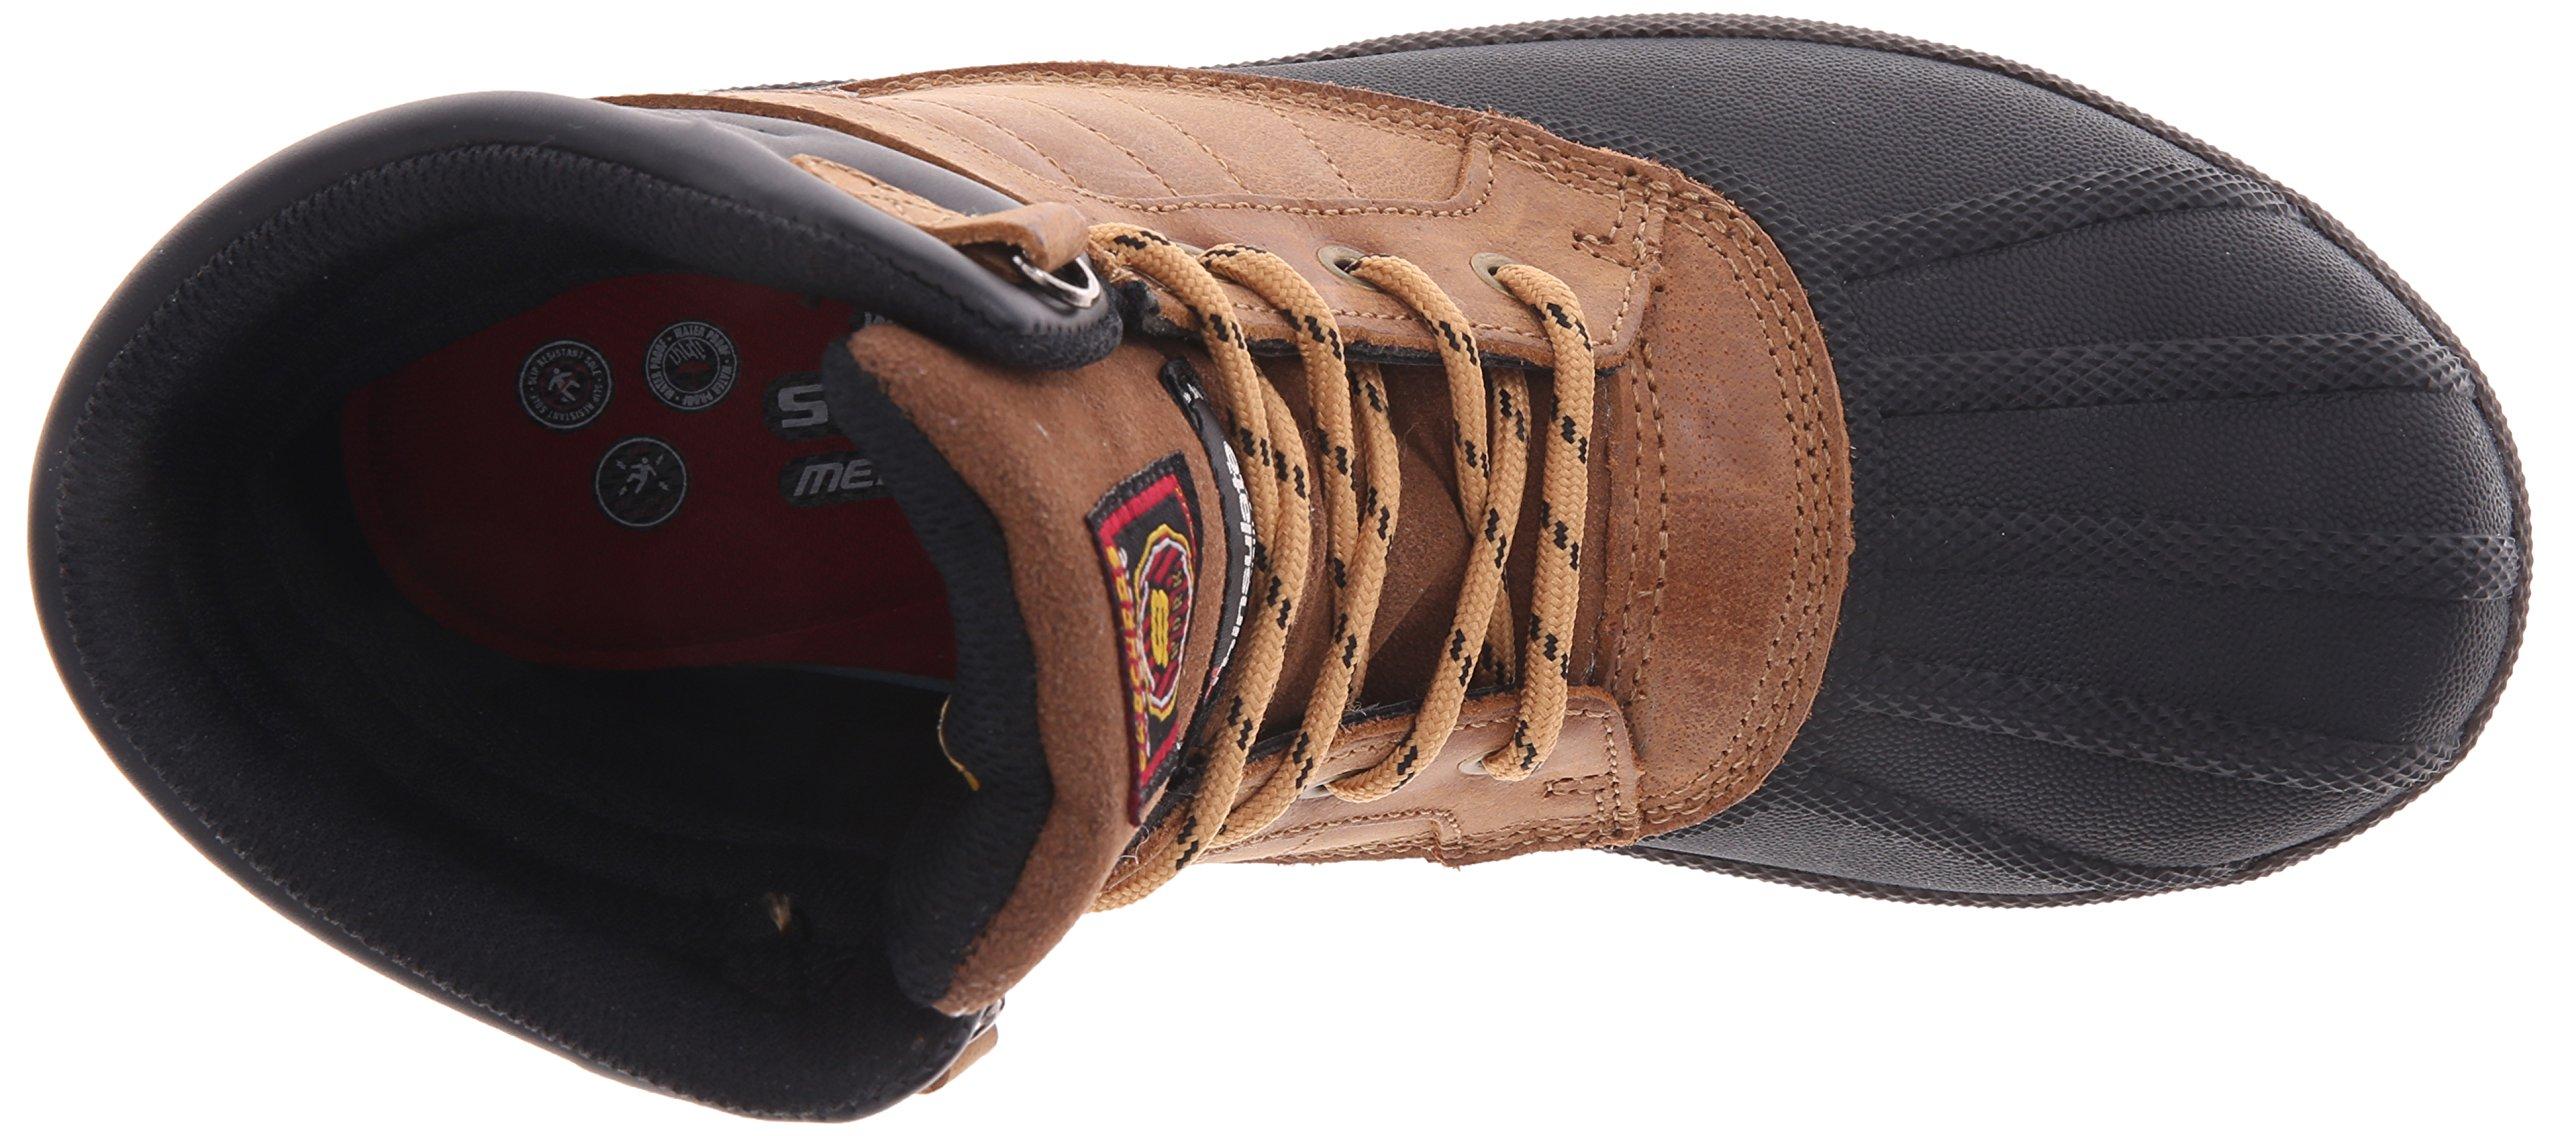 Skechers for Work Women's Duck Rain Boot, Brown, 5.5 M US by Skechers (Image #8)